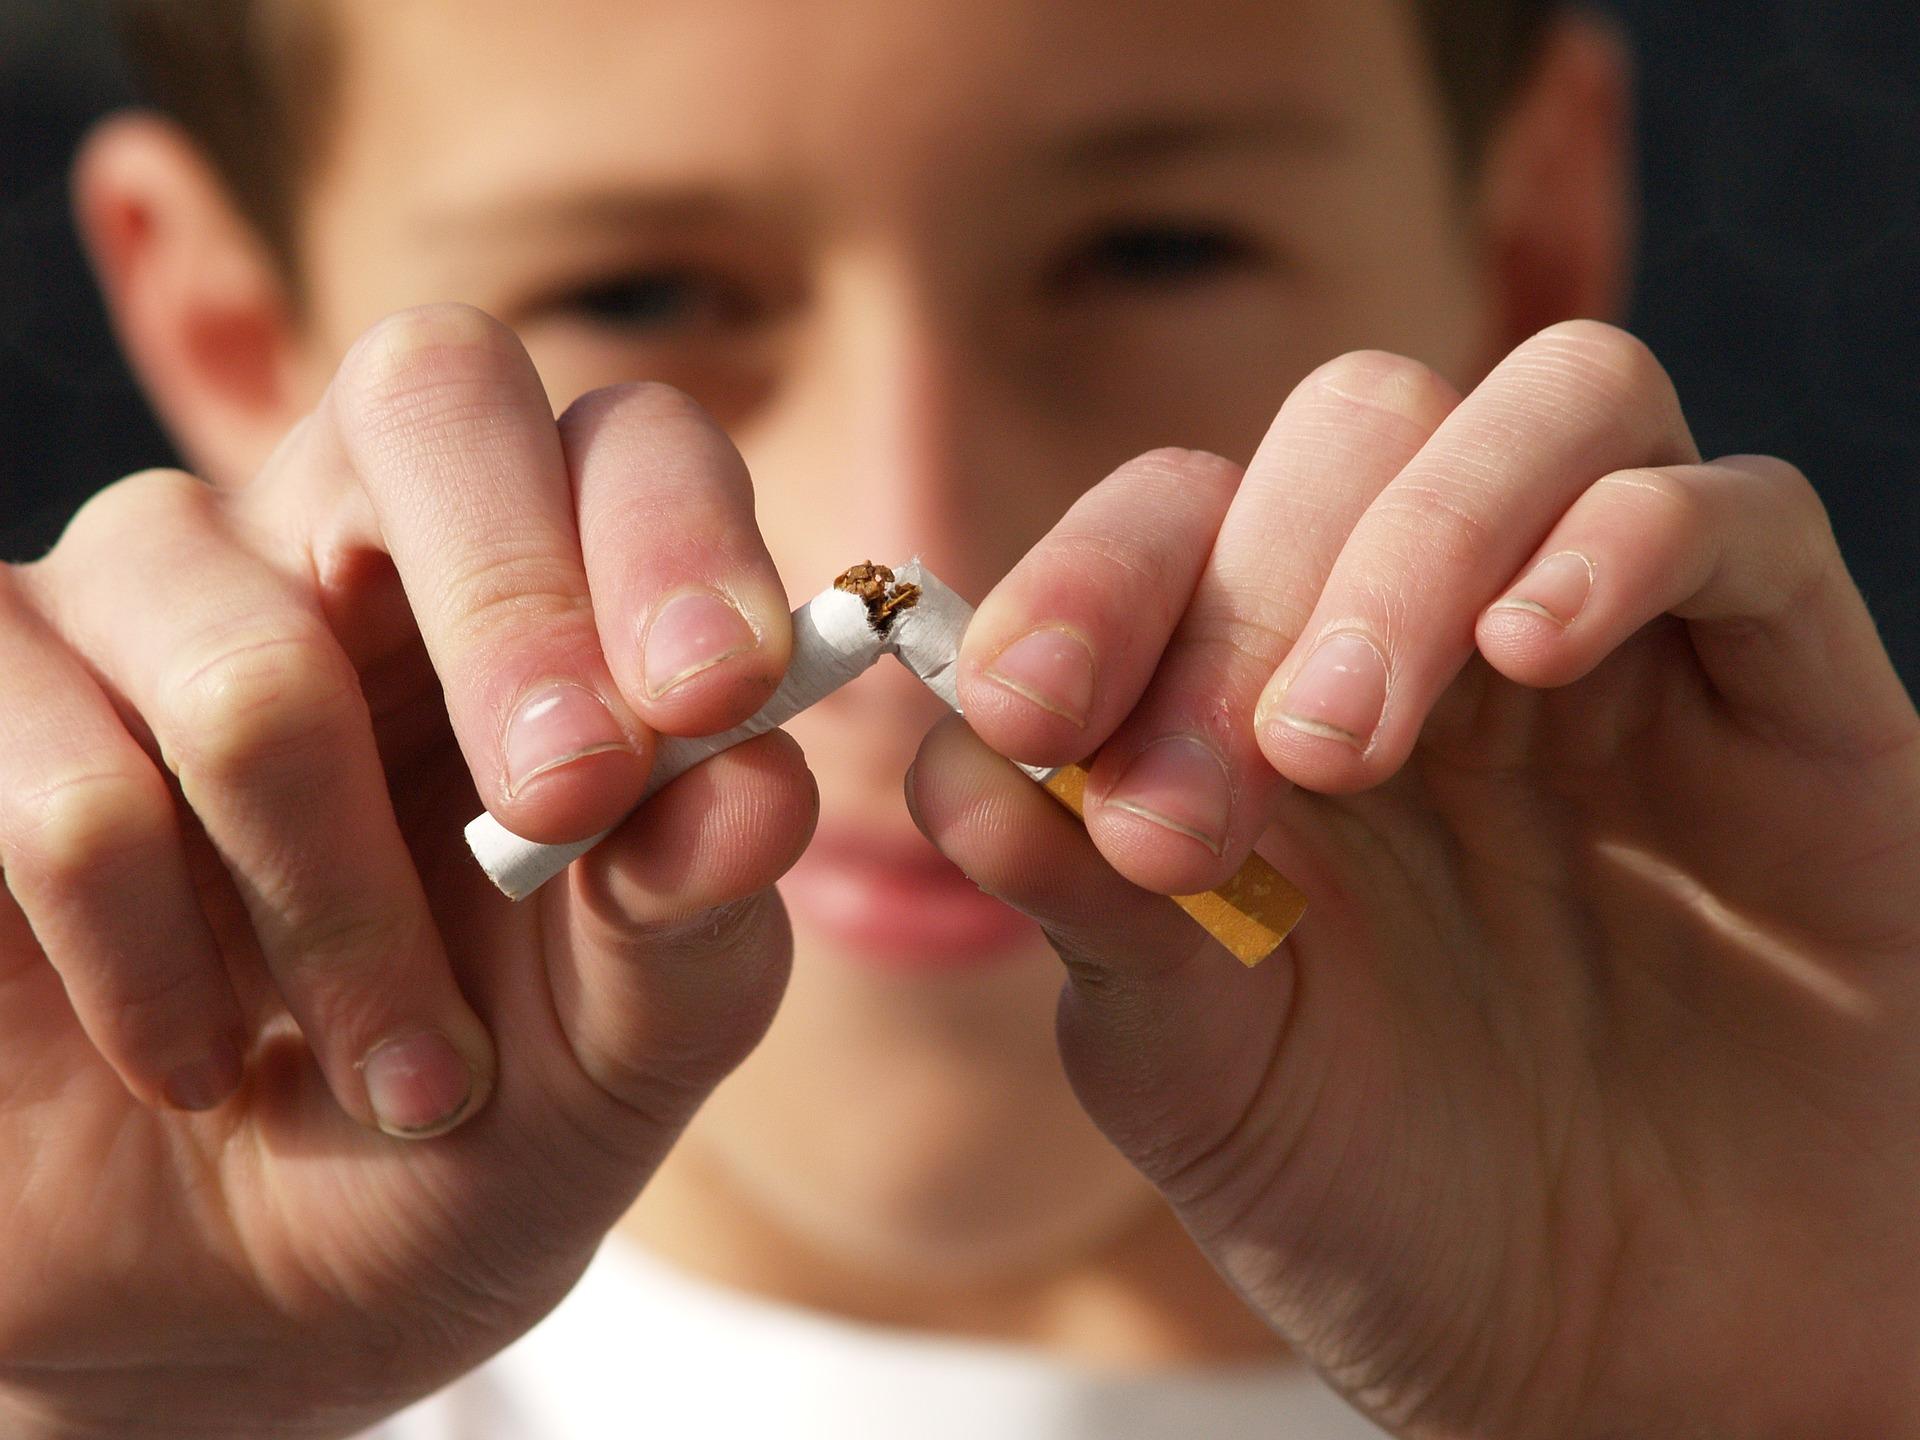 arrêter de fumer